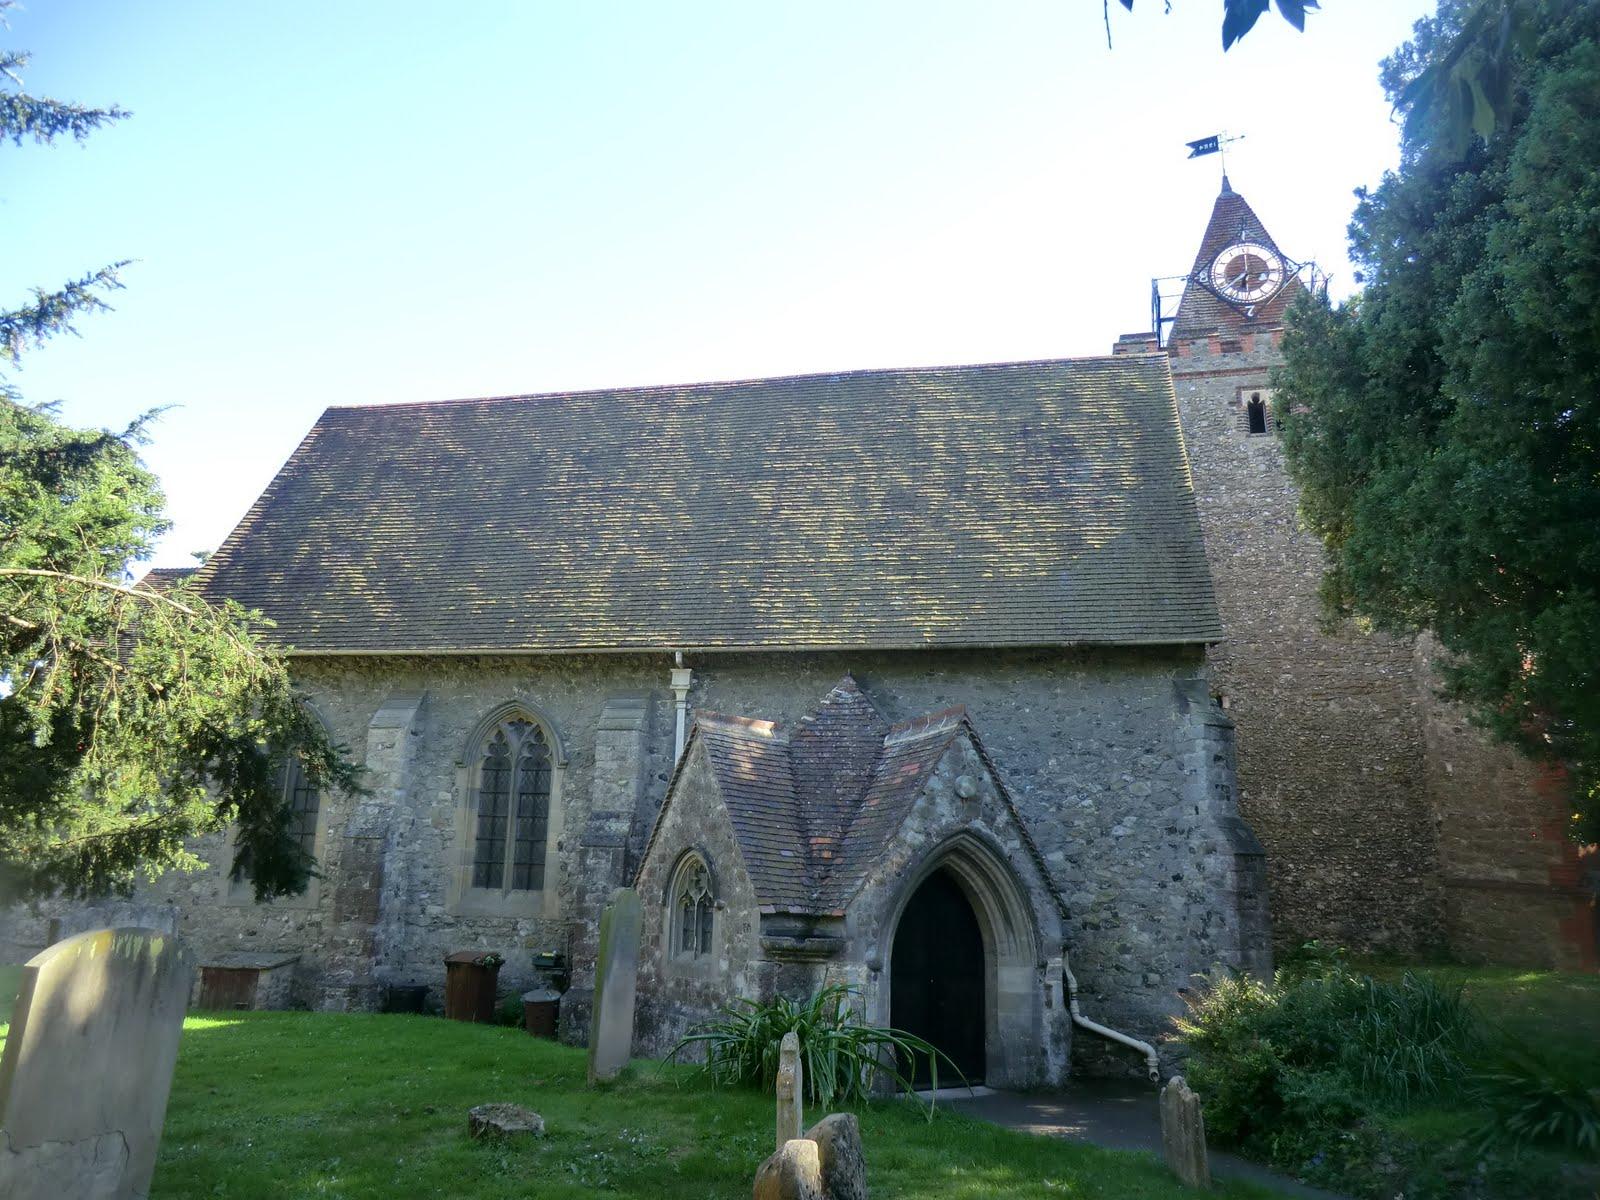 CIMG3939 St John the Baptist church, Halling